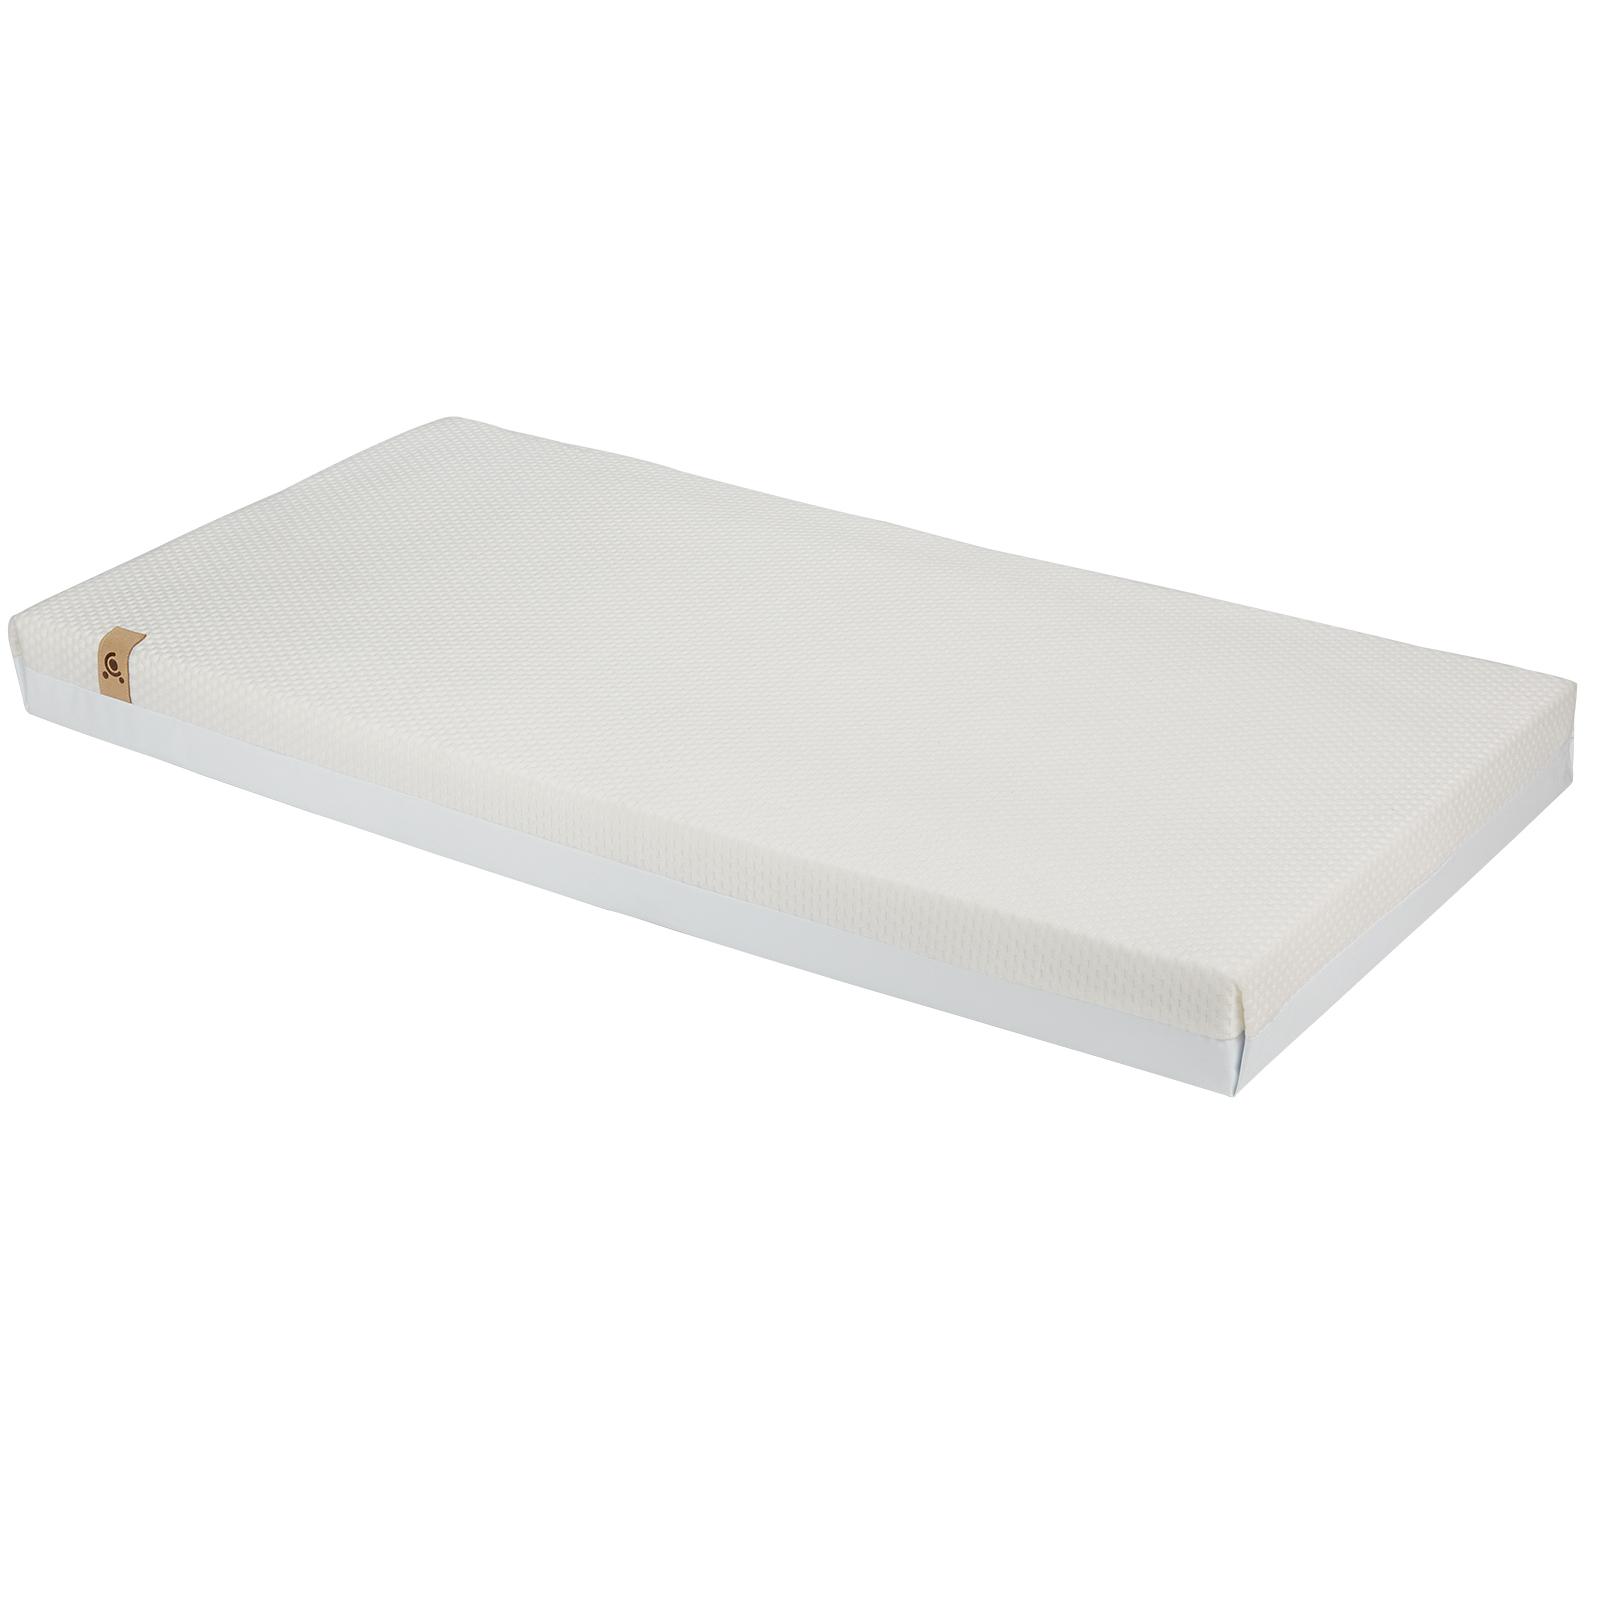 Pružinová matrace Signature 120 x 60 cm, Cream